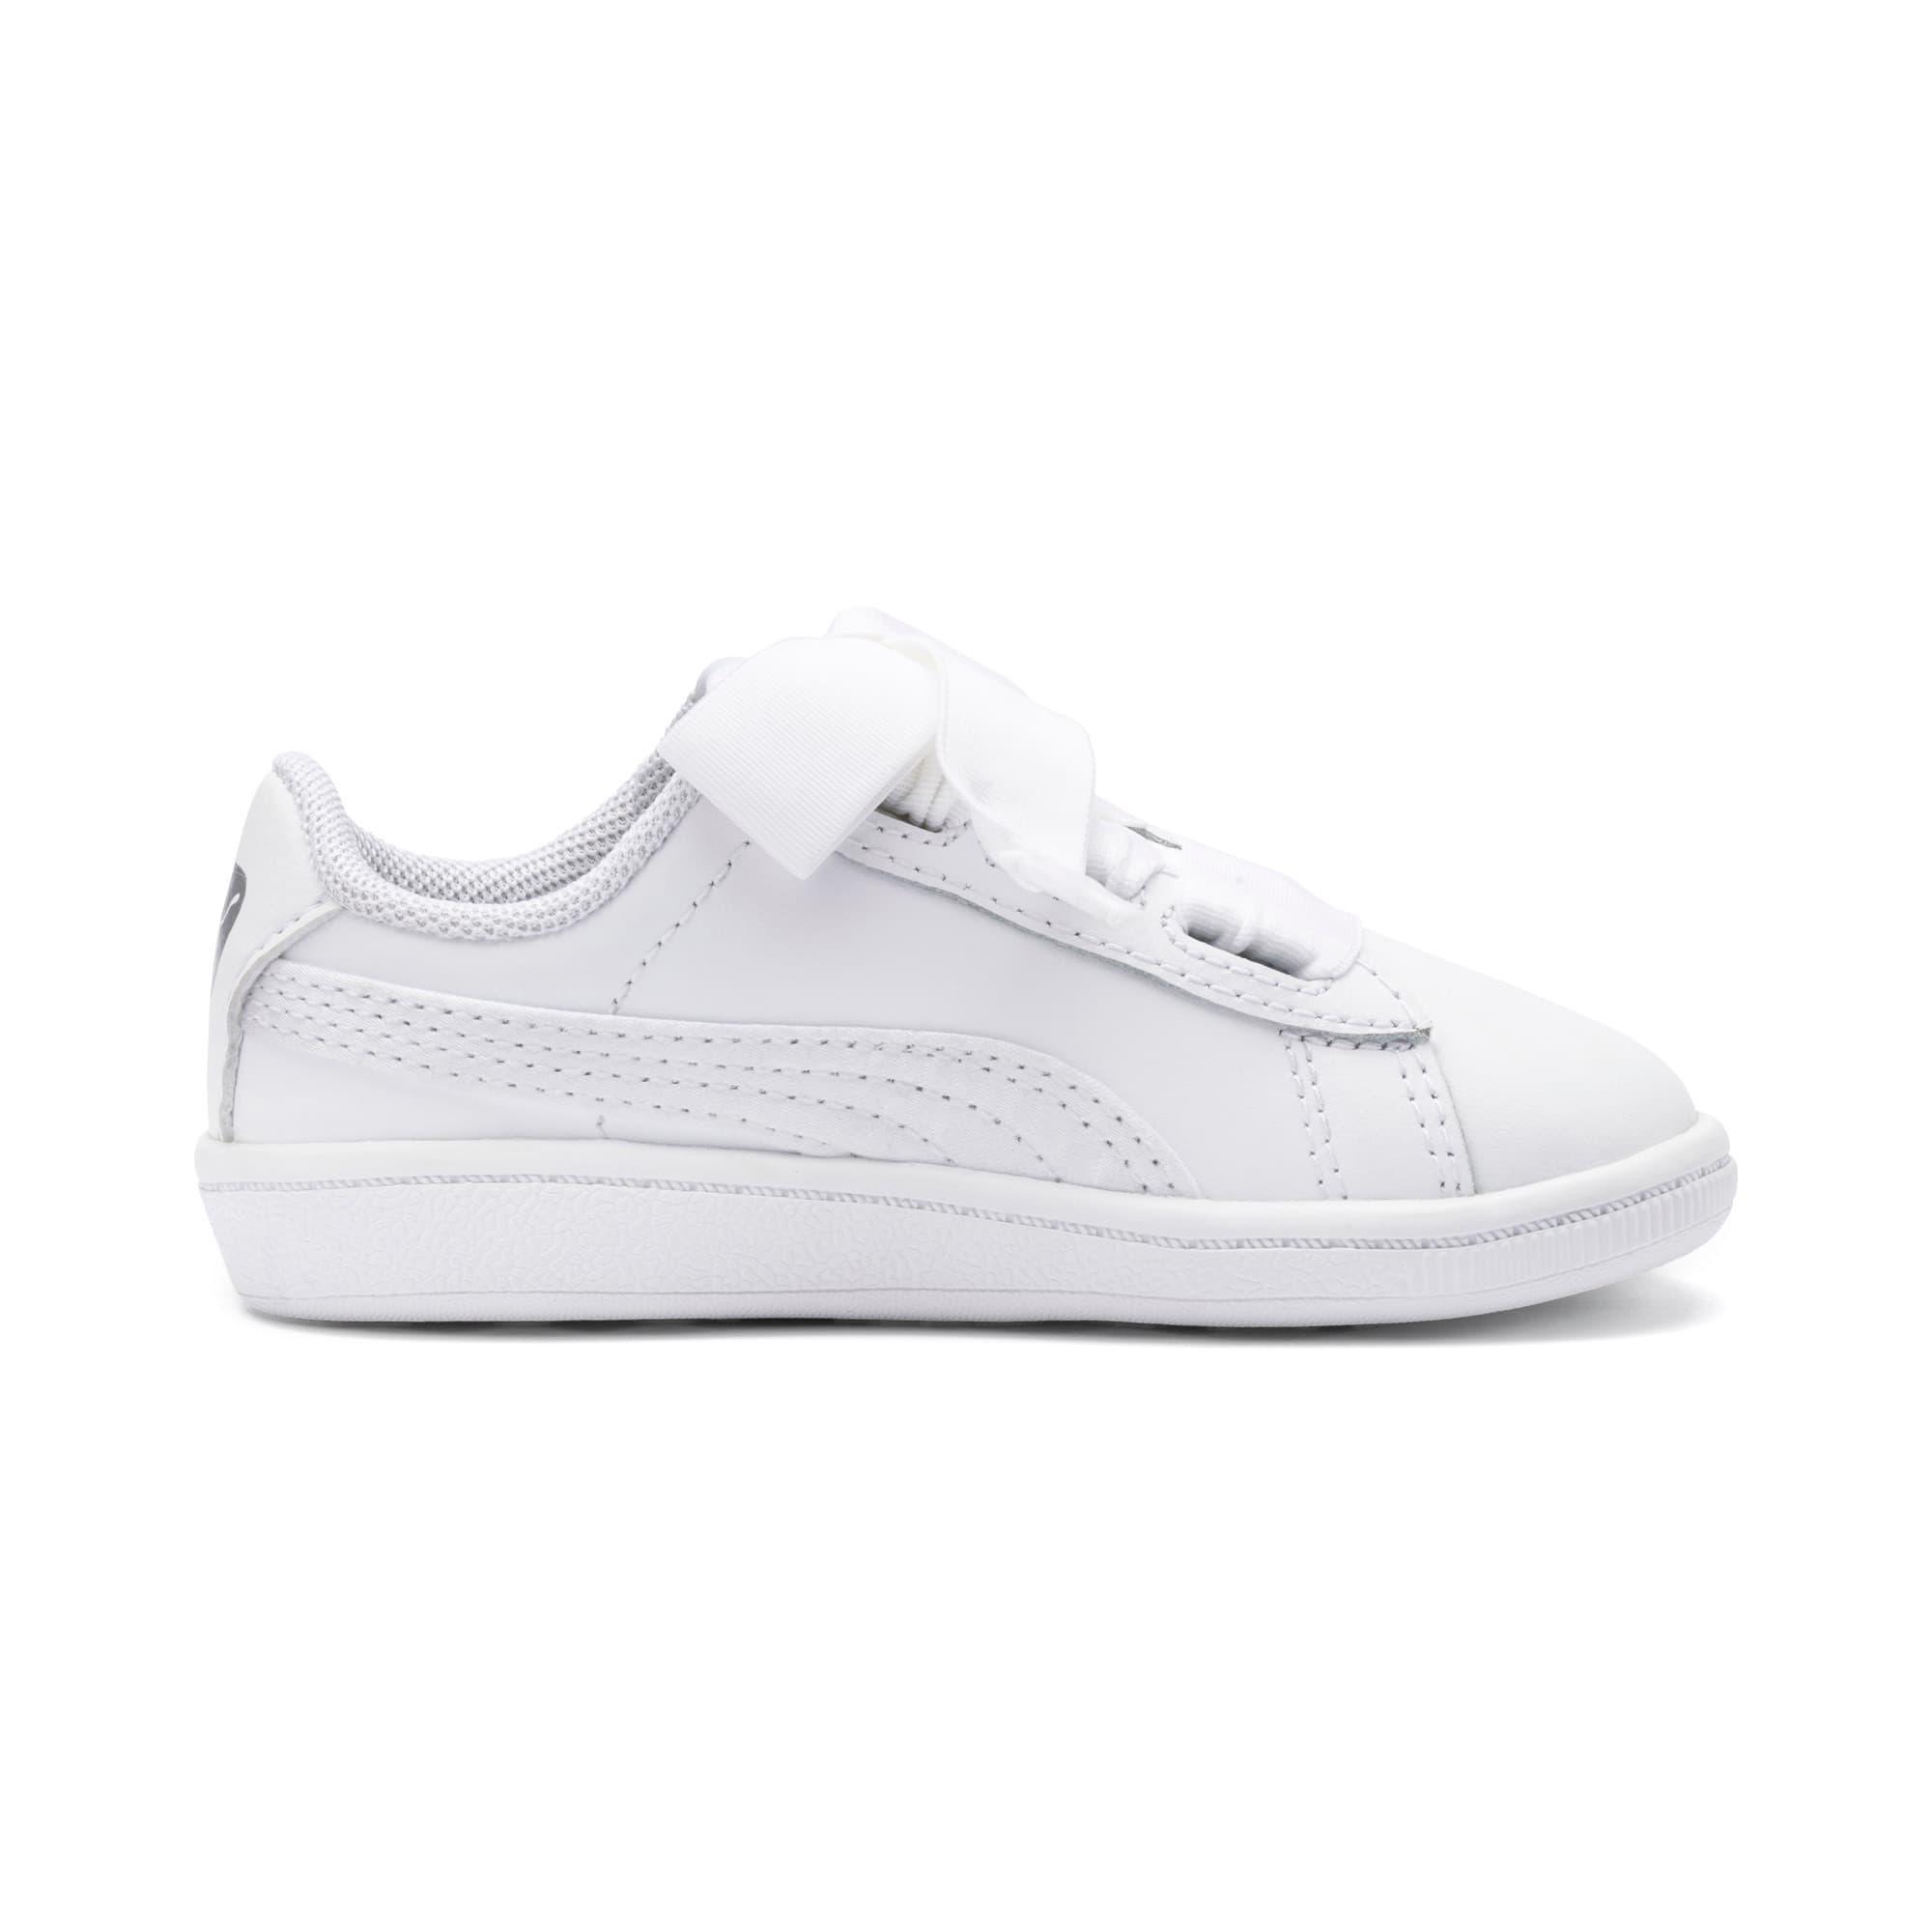 Miniatura 5 de ZapatosPUMA Vikky Ribbon Satin AC para bebés, Puma White-Puma White, mediano